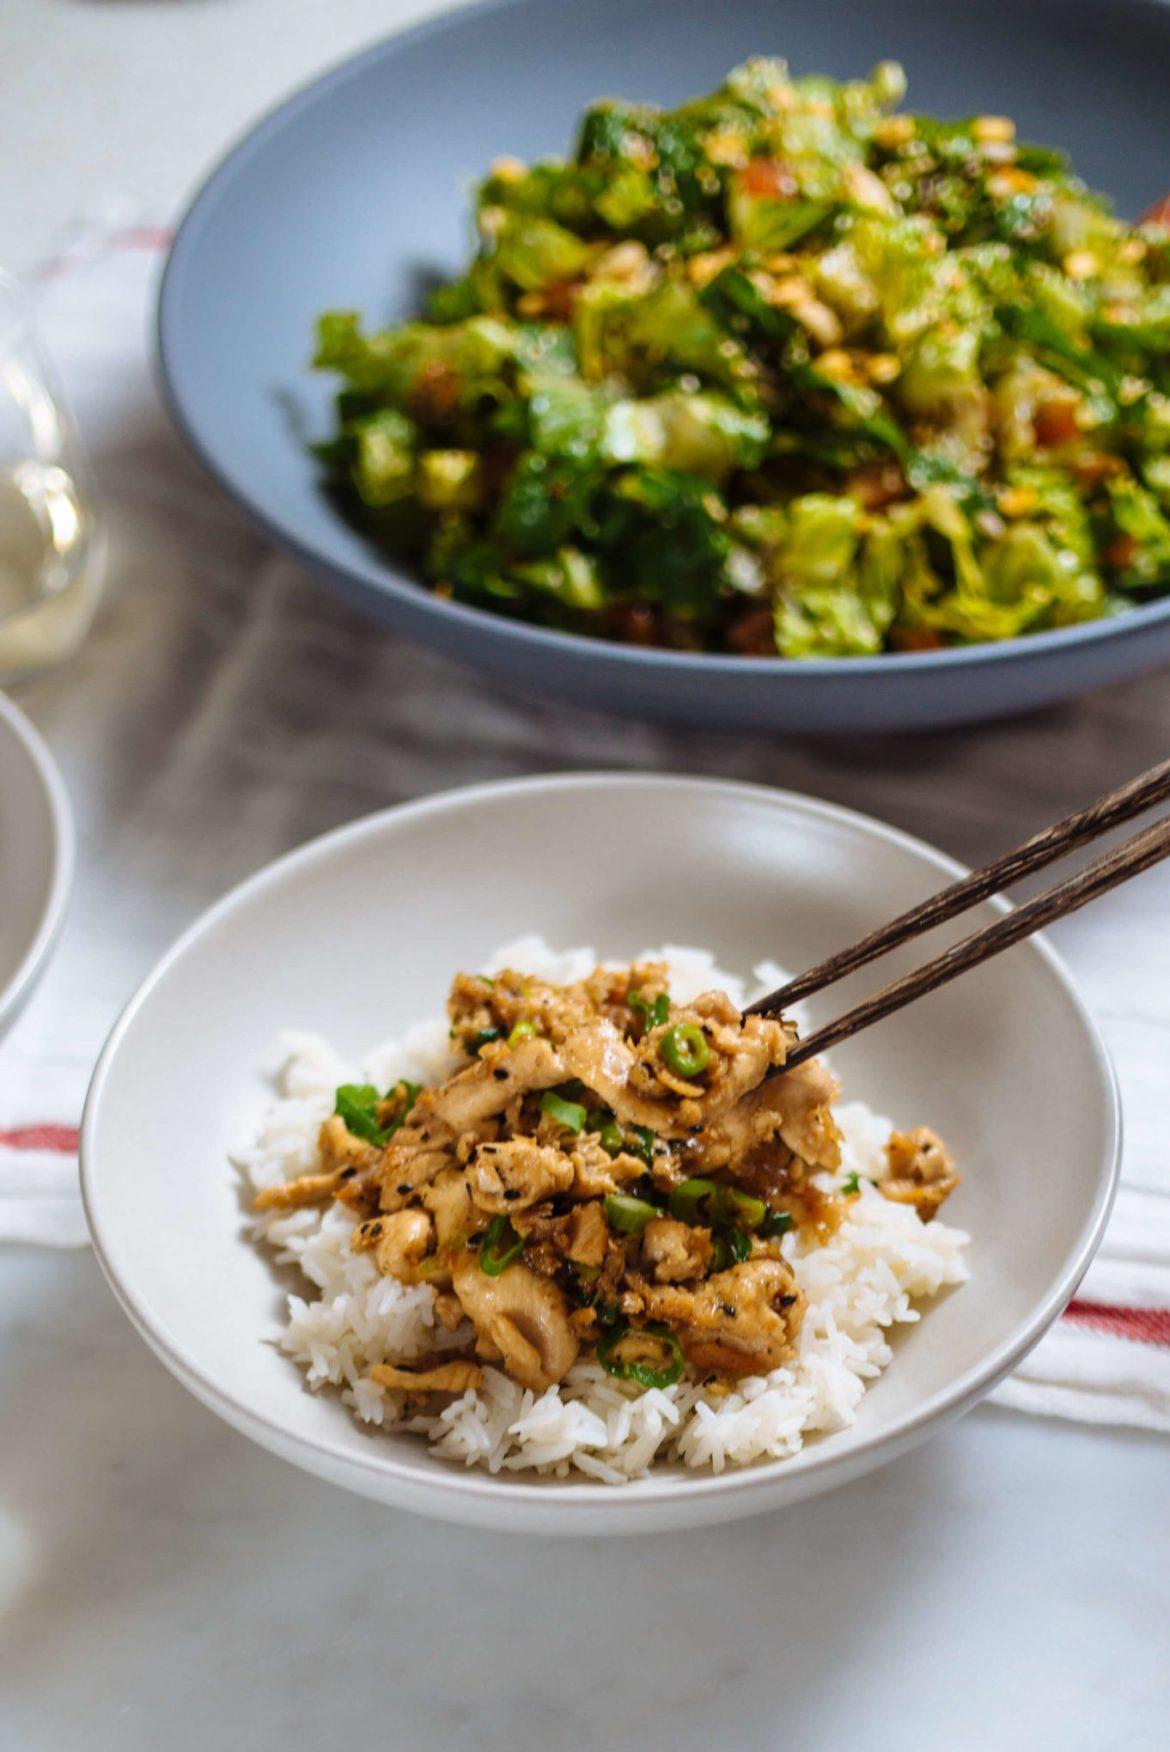 Burma Superstar cookbook Sesame Chicken made by The Taste Edit